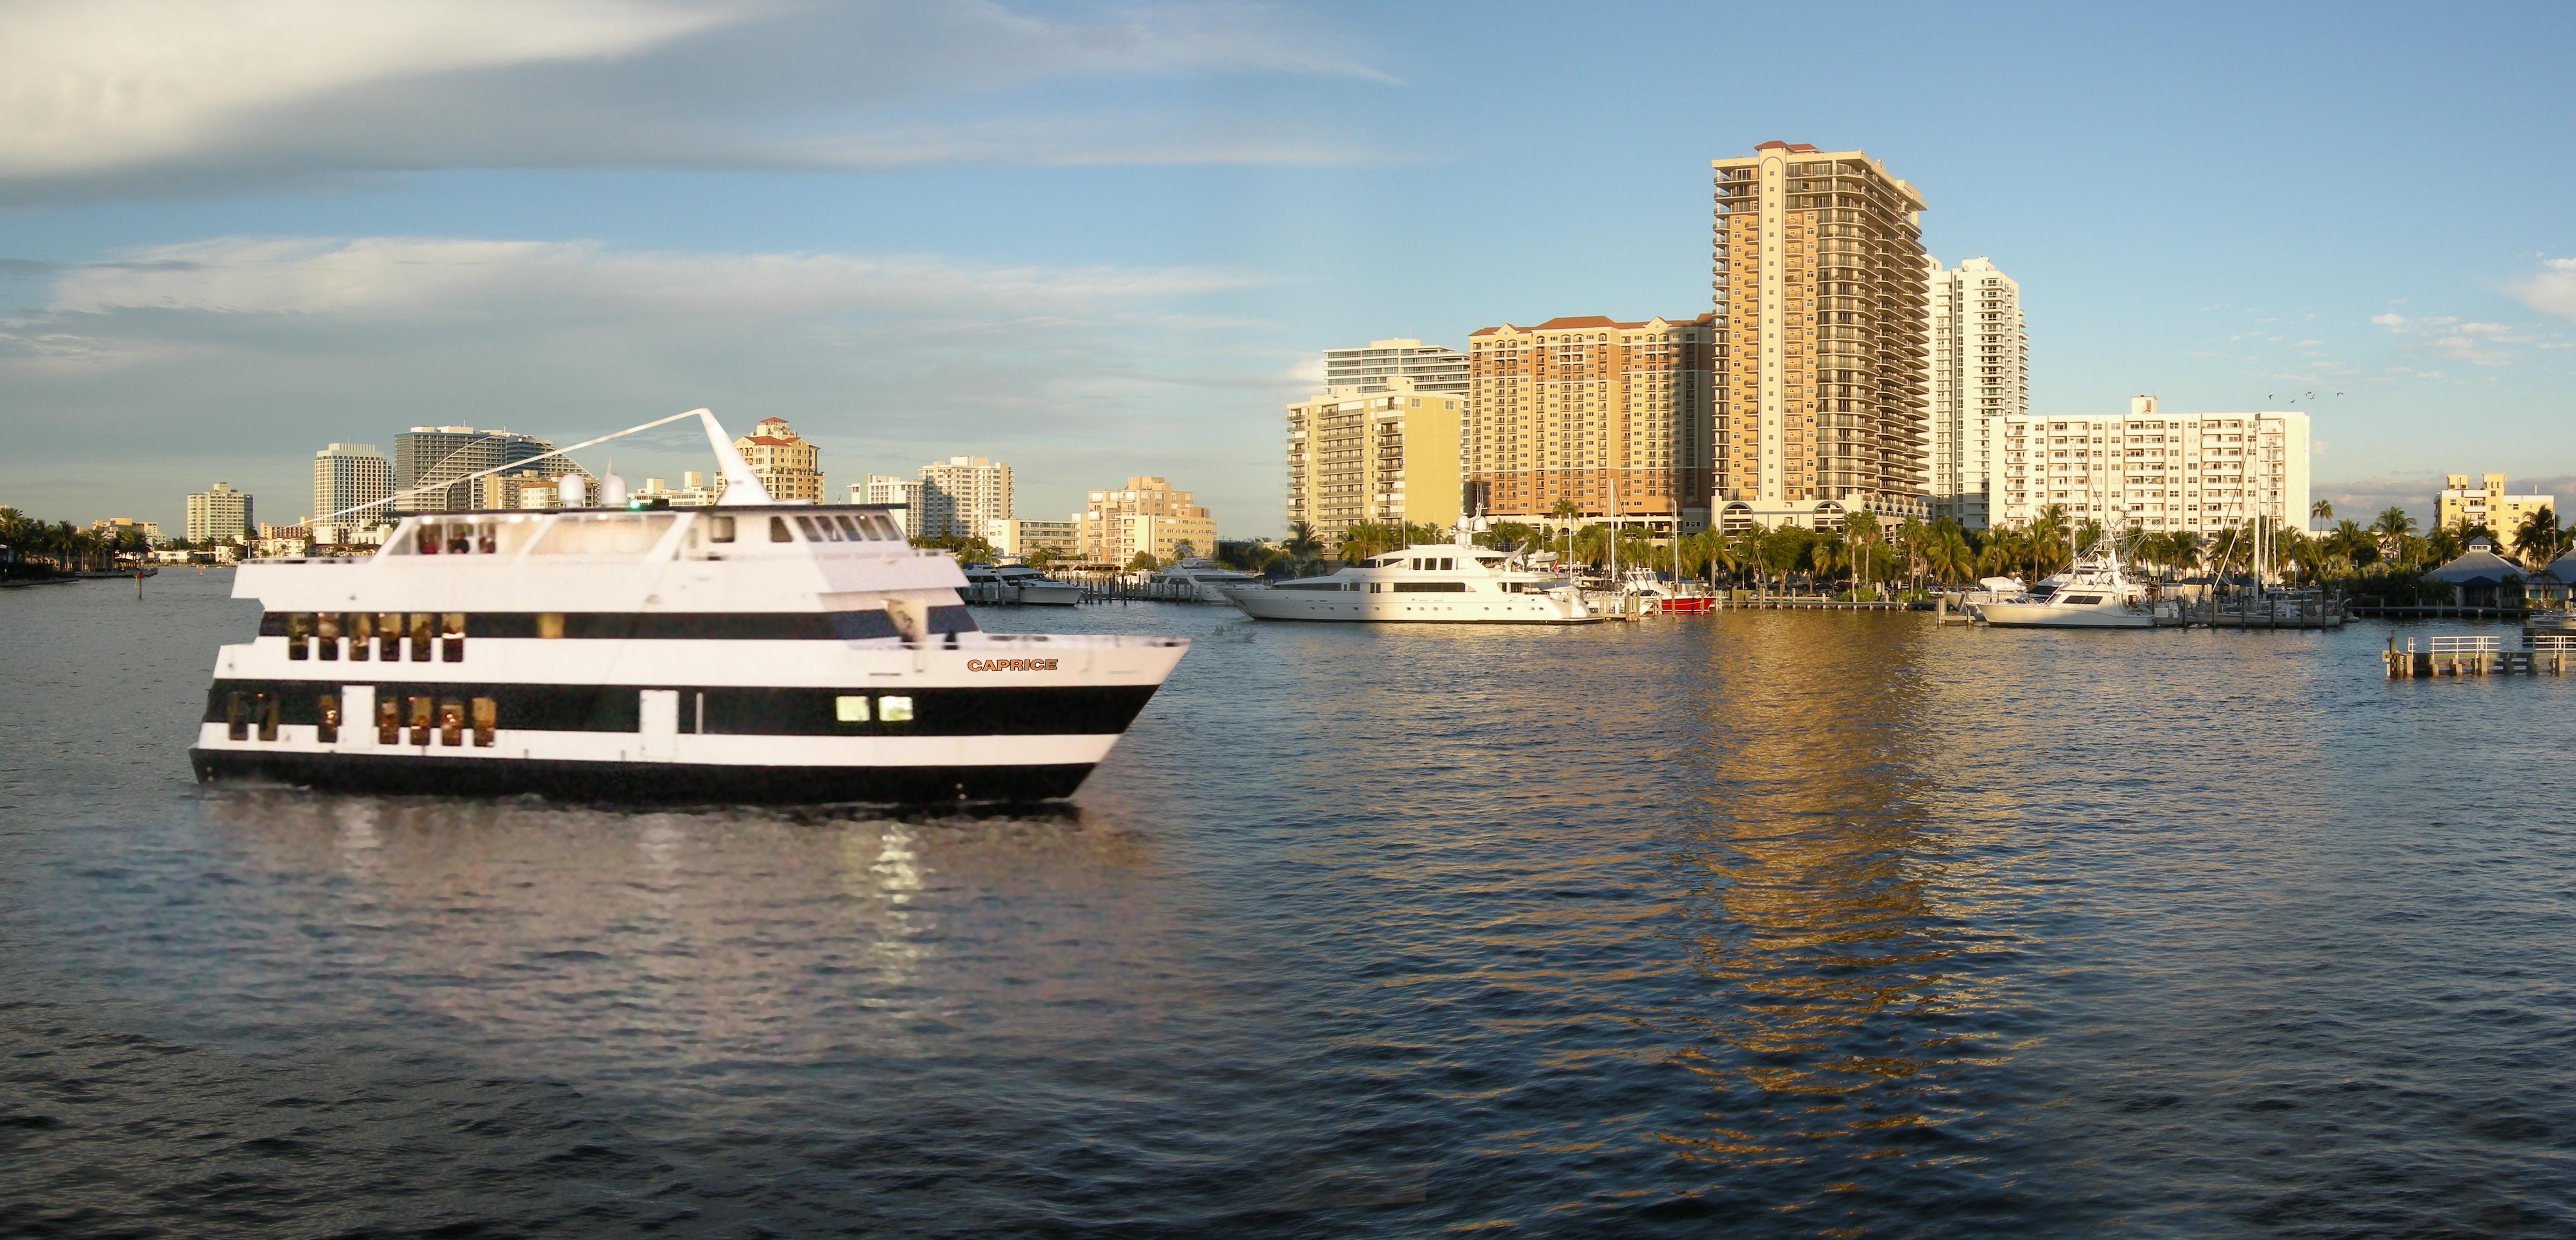 Caprice Sunset Cruise